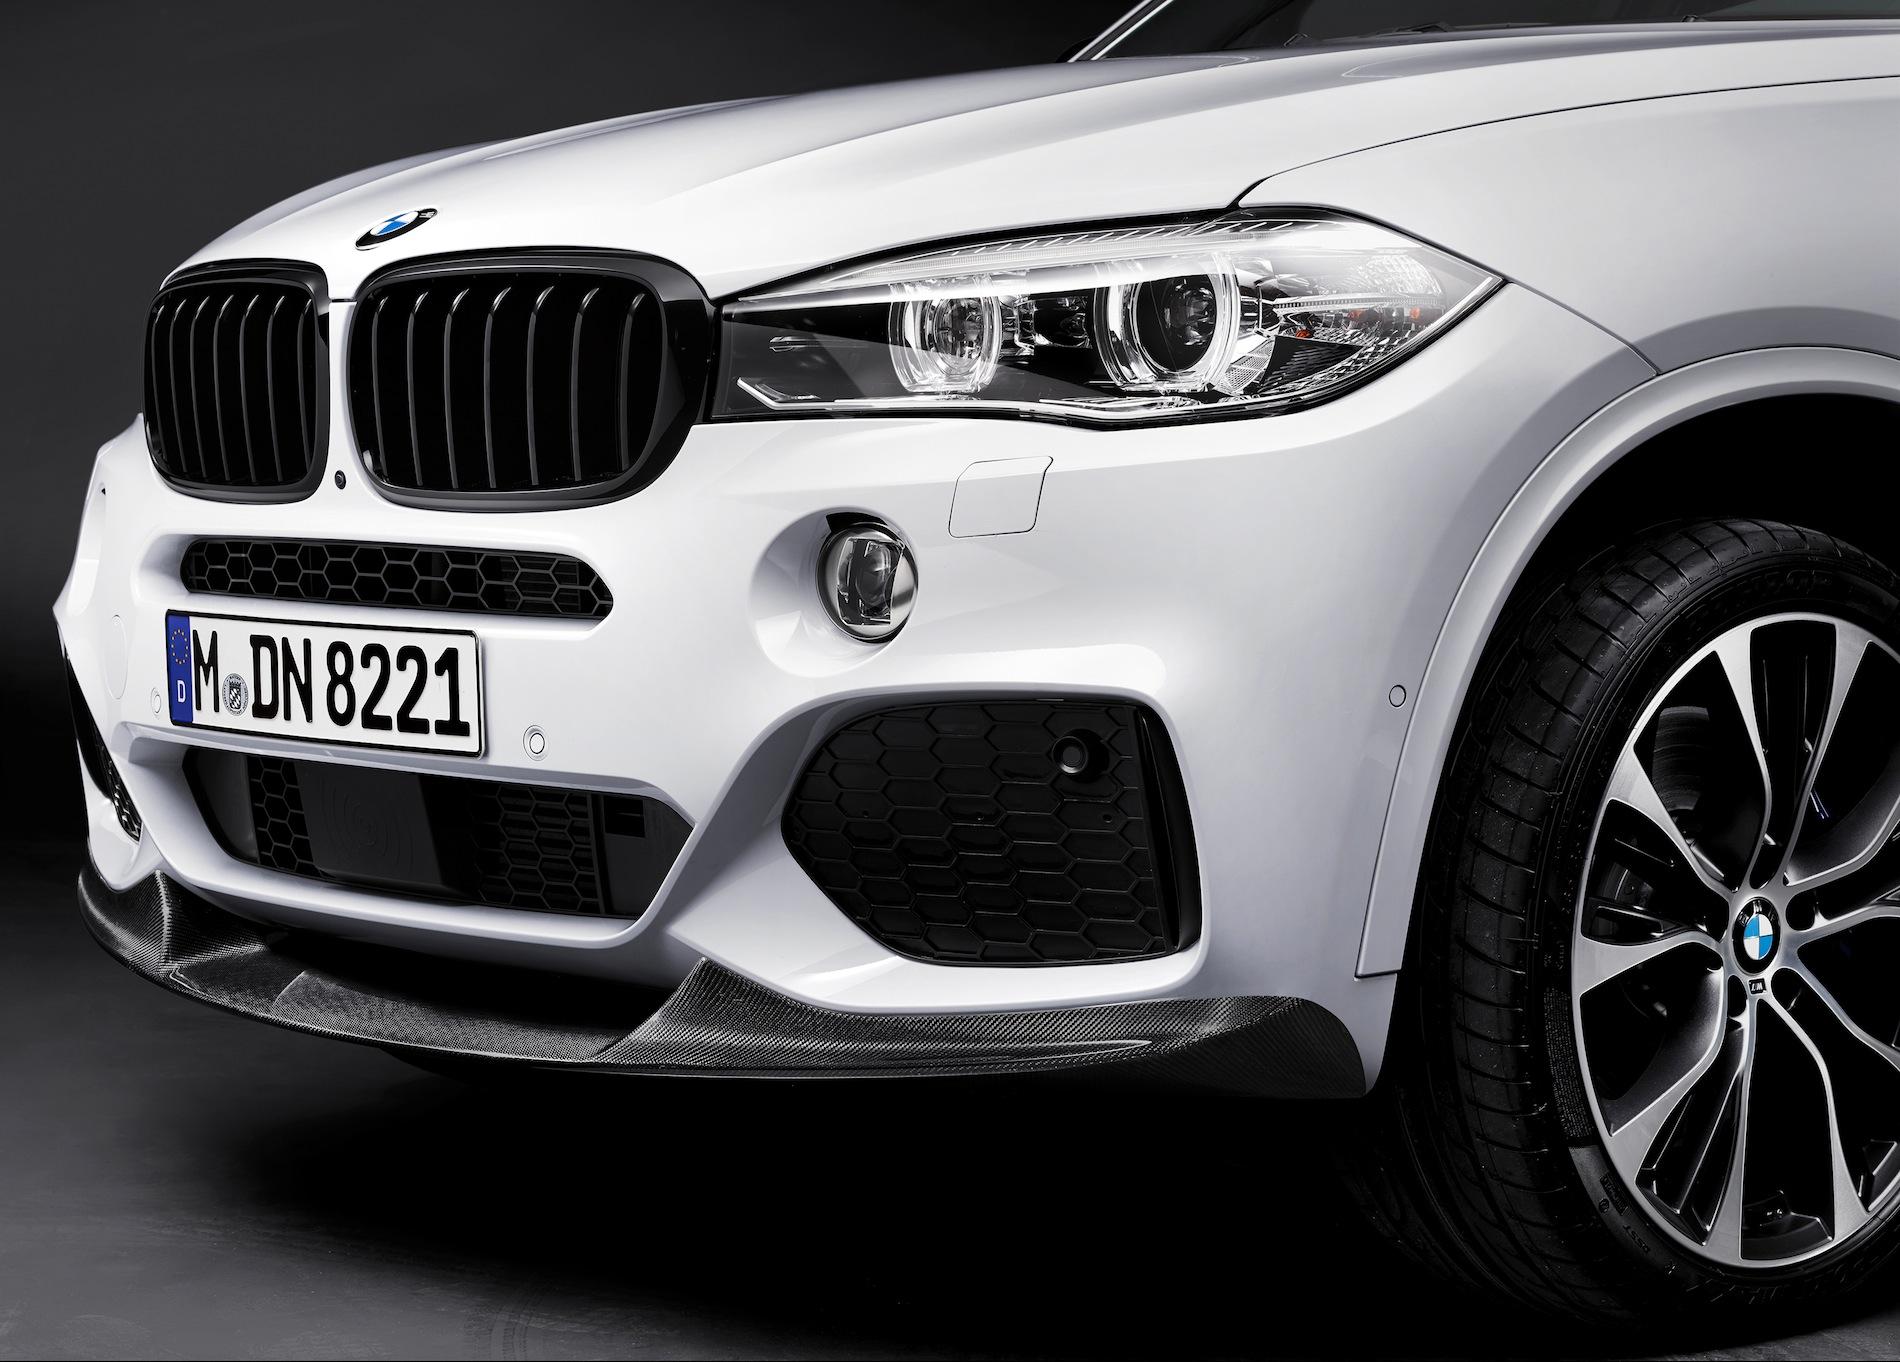 Mercedes G Professional >> 2014-2016 BMW X5 F15 PERFORMANCE AERO PACK UPGRADE BODY KIT BODY STYLING | Dynamic Customs